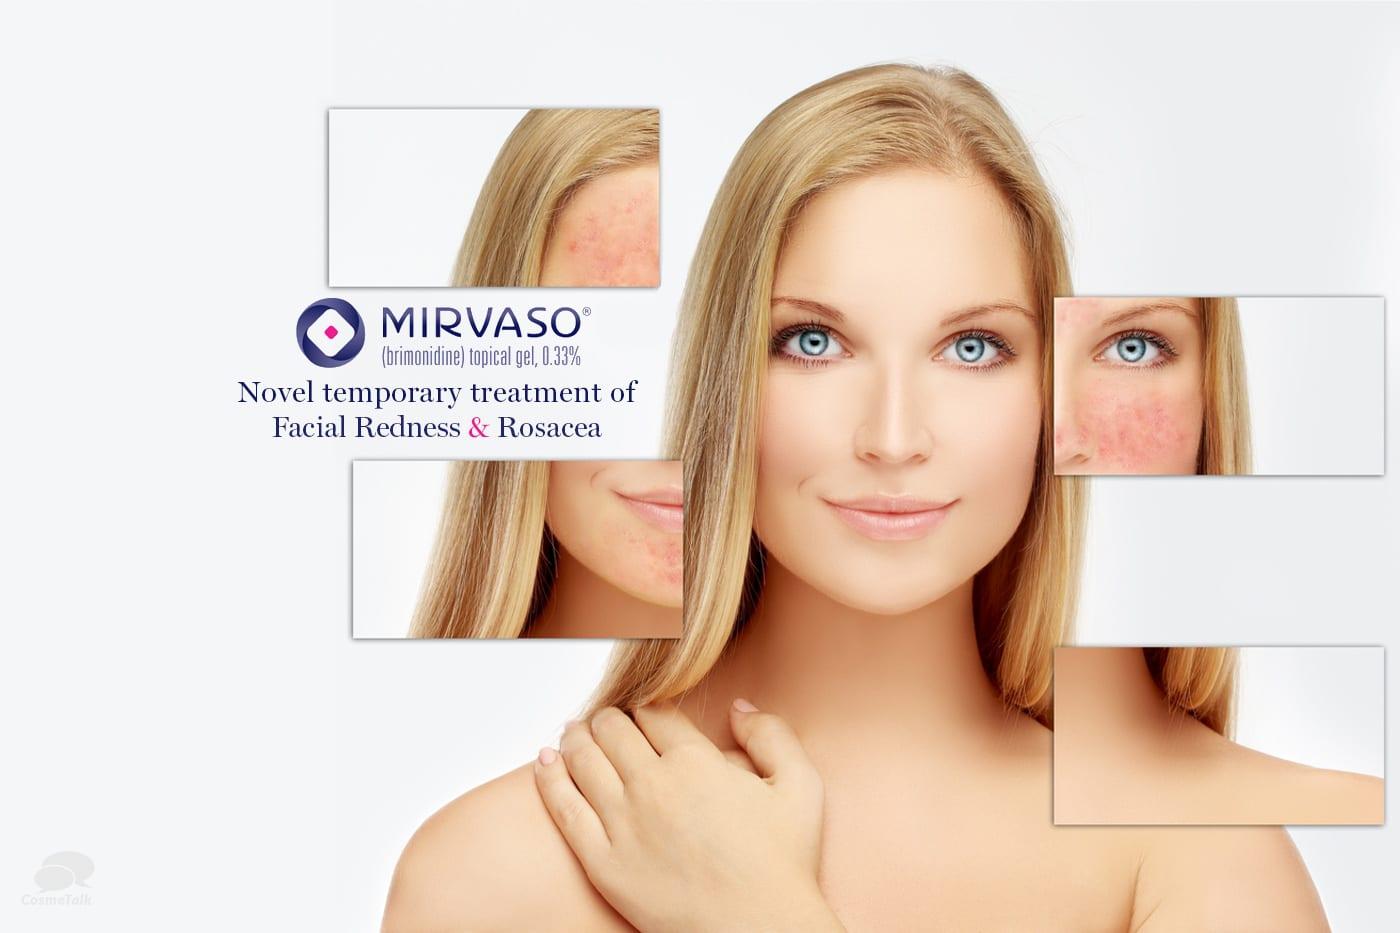 Mirvaso novel temporary treatment of facial redness